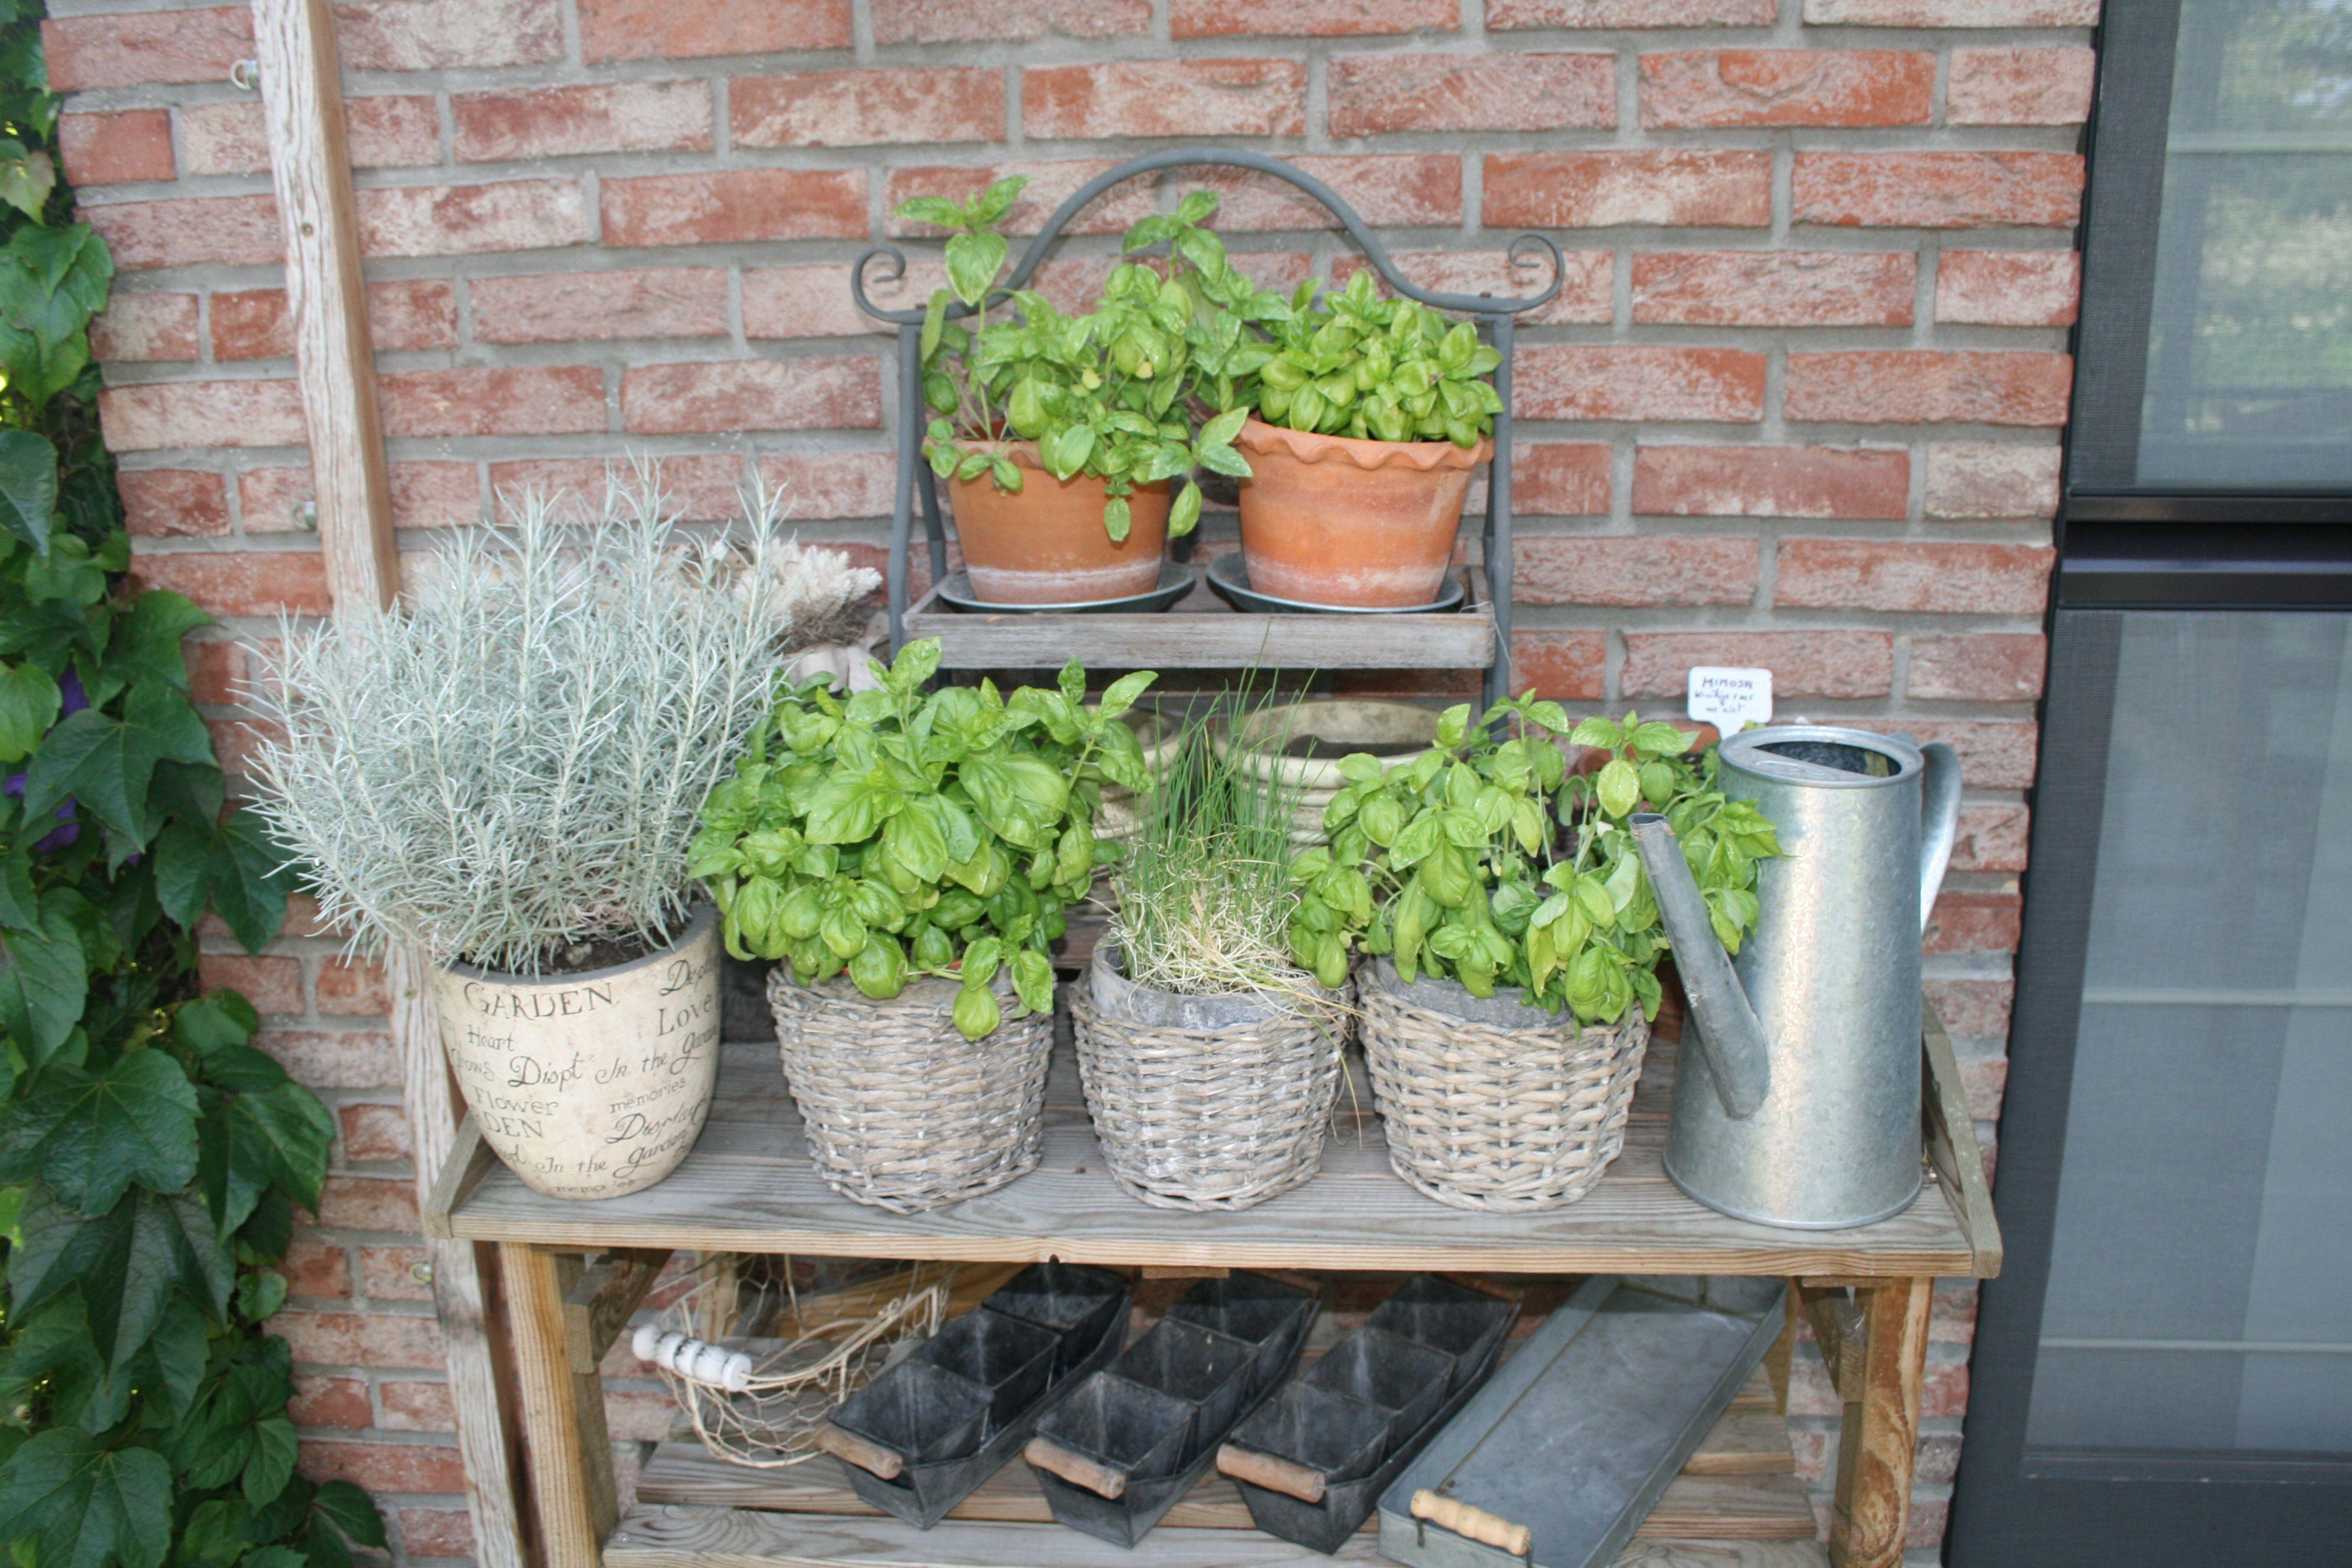 Garten Janssen kräuter diepenbeek garten janssen garten